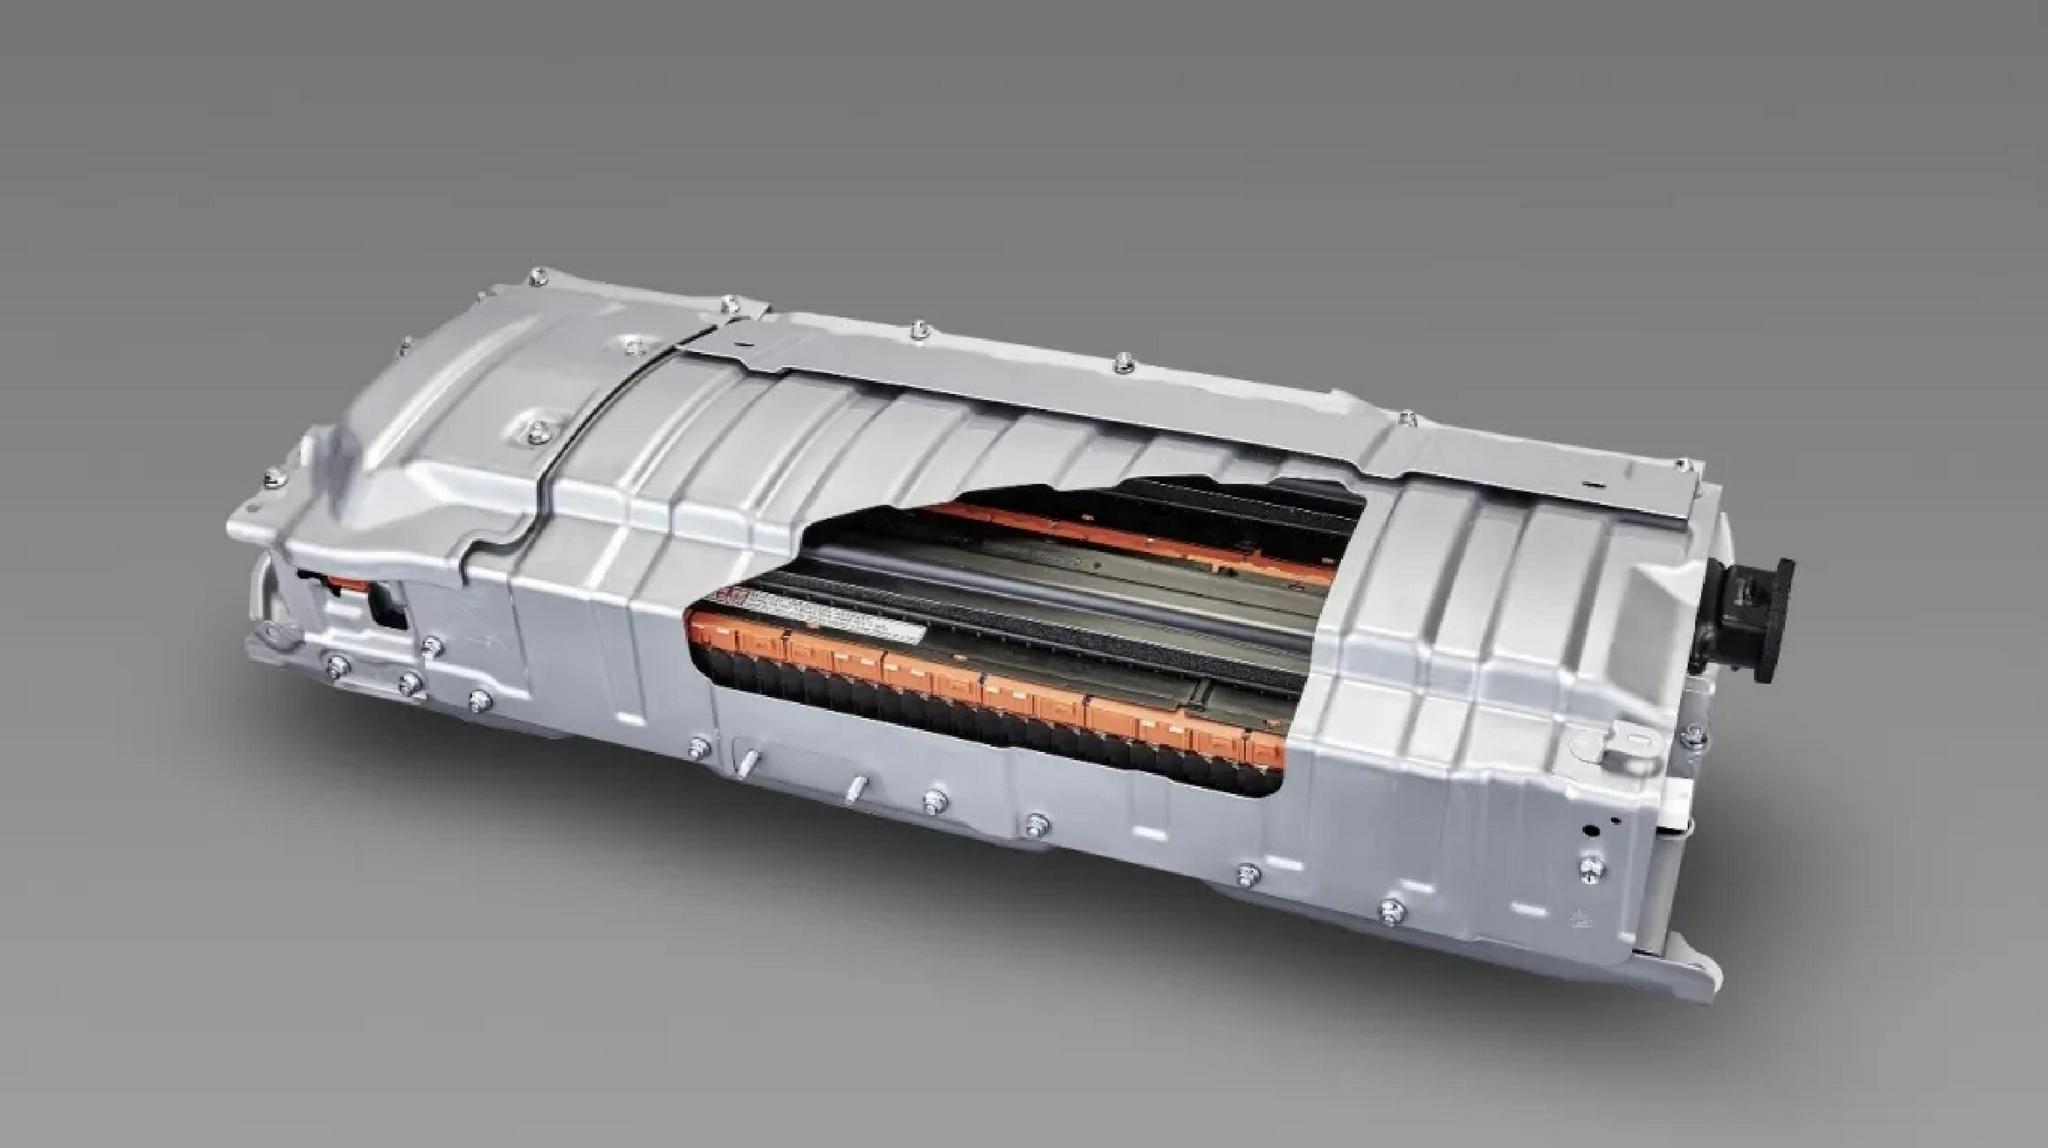 LG研发出锂电池低温充电技术:最低降至25度